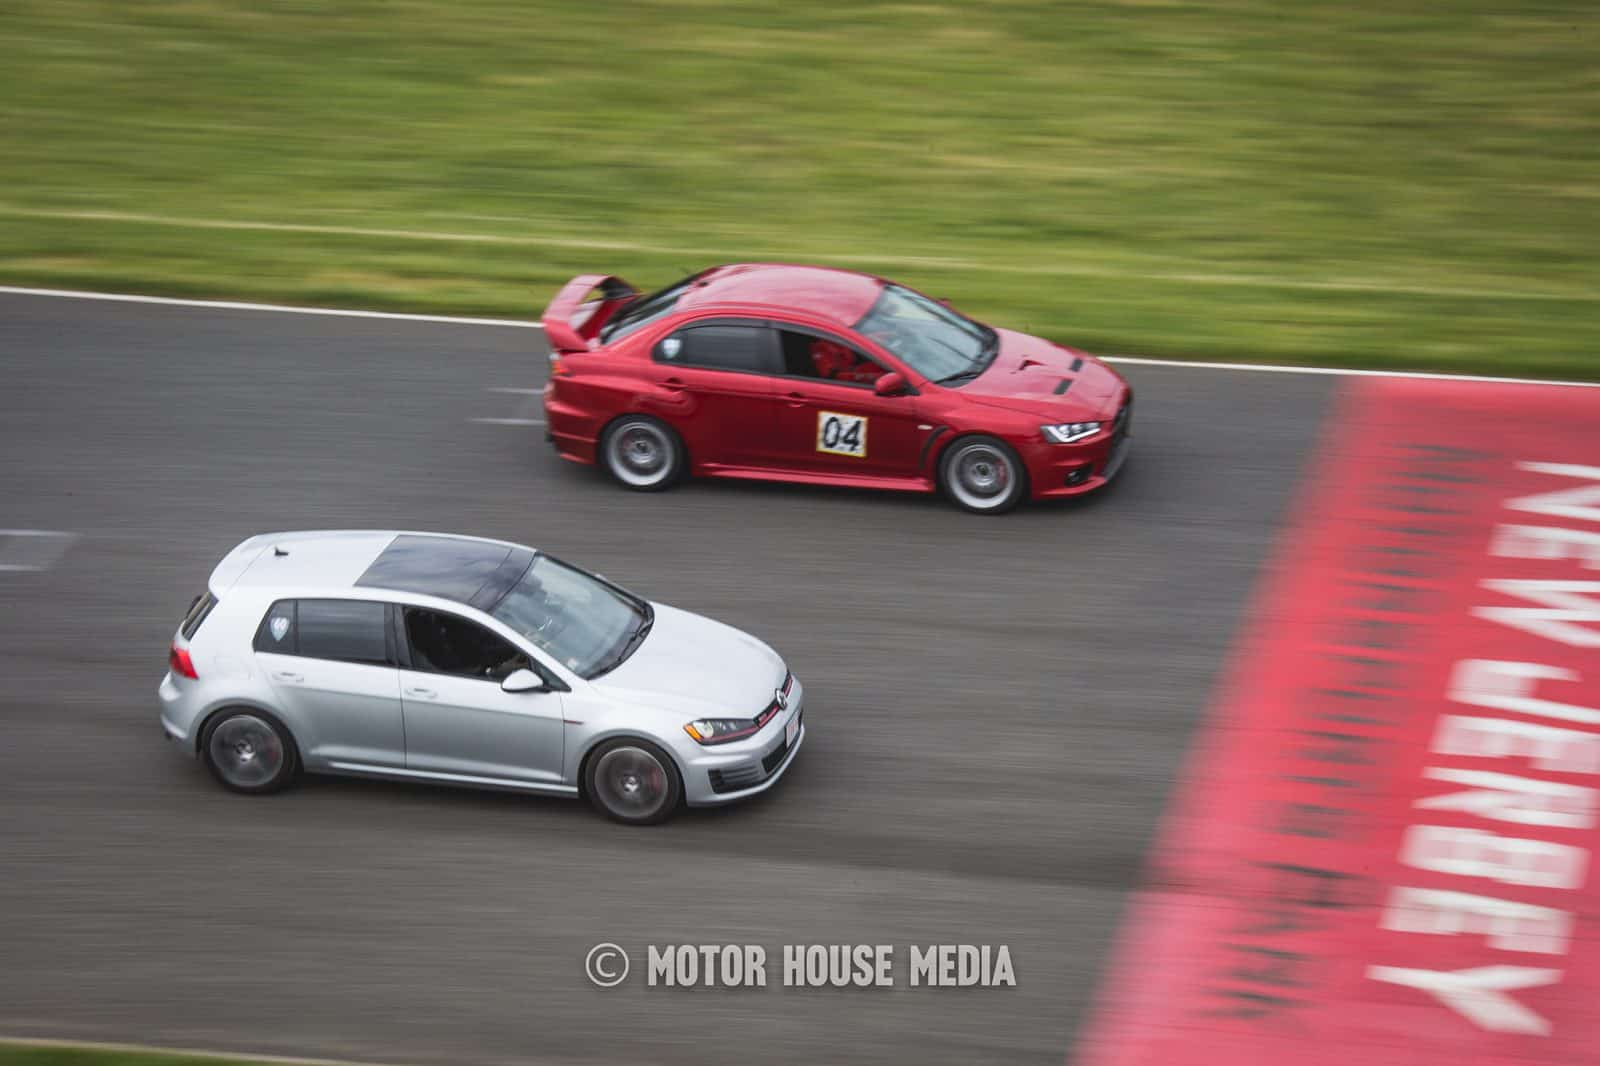 VW and Lancer Roll Racing